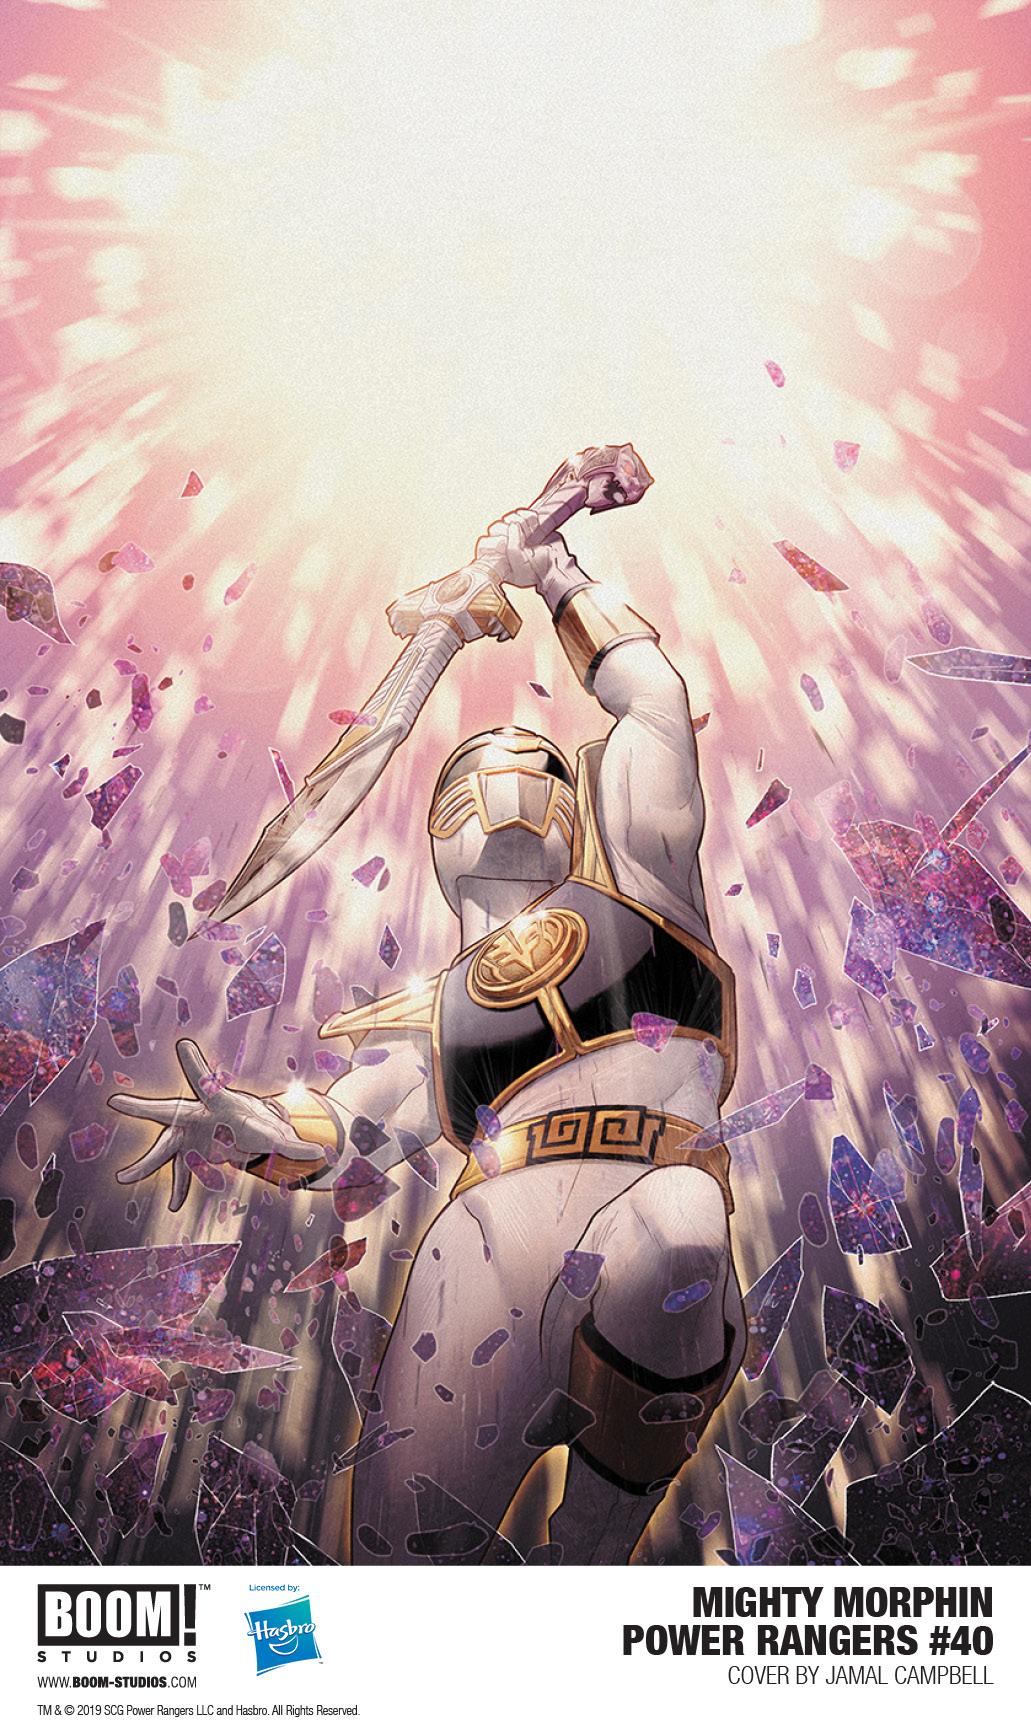 Mighty Morphin Power Rangers #40